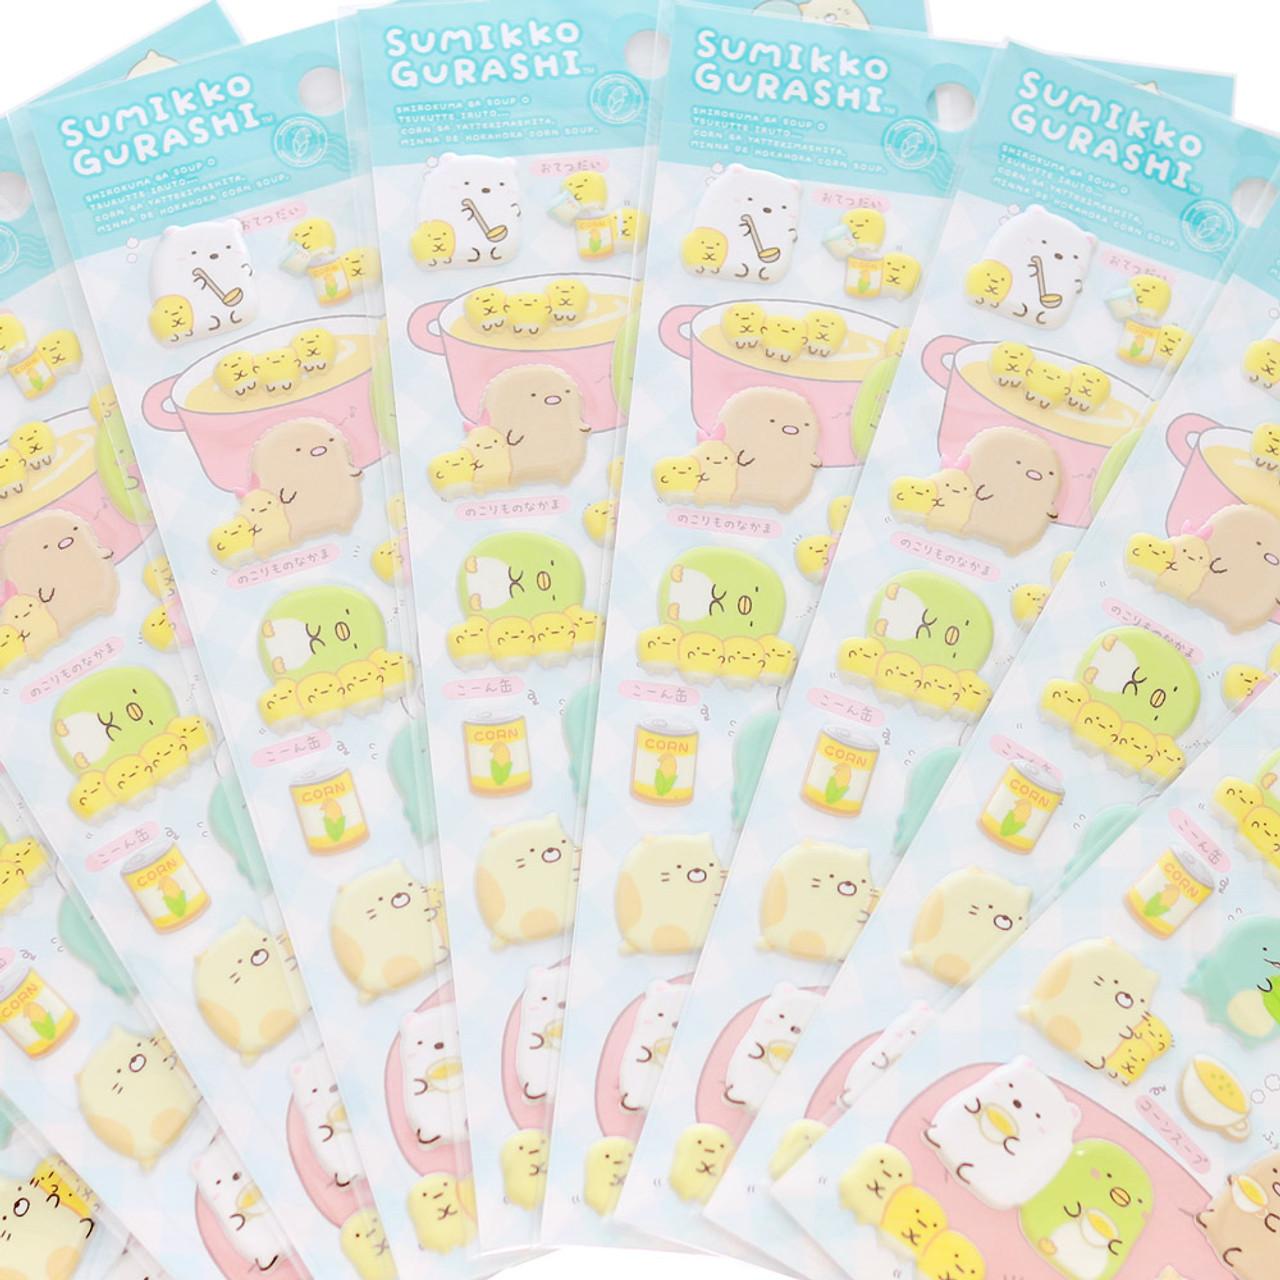 Sumikko Gurashi Funny Collection Sticker SE49202 - Drink ( Close-up 02 )